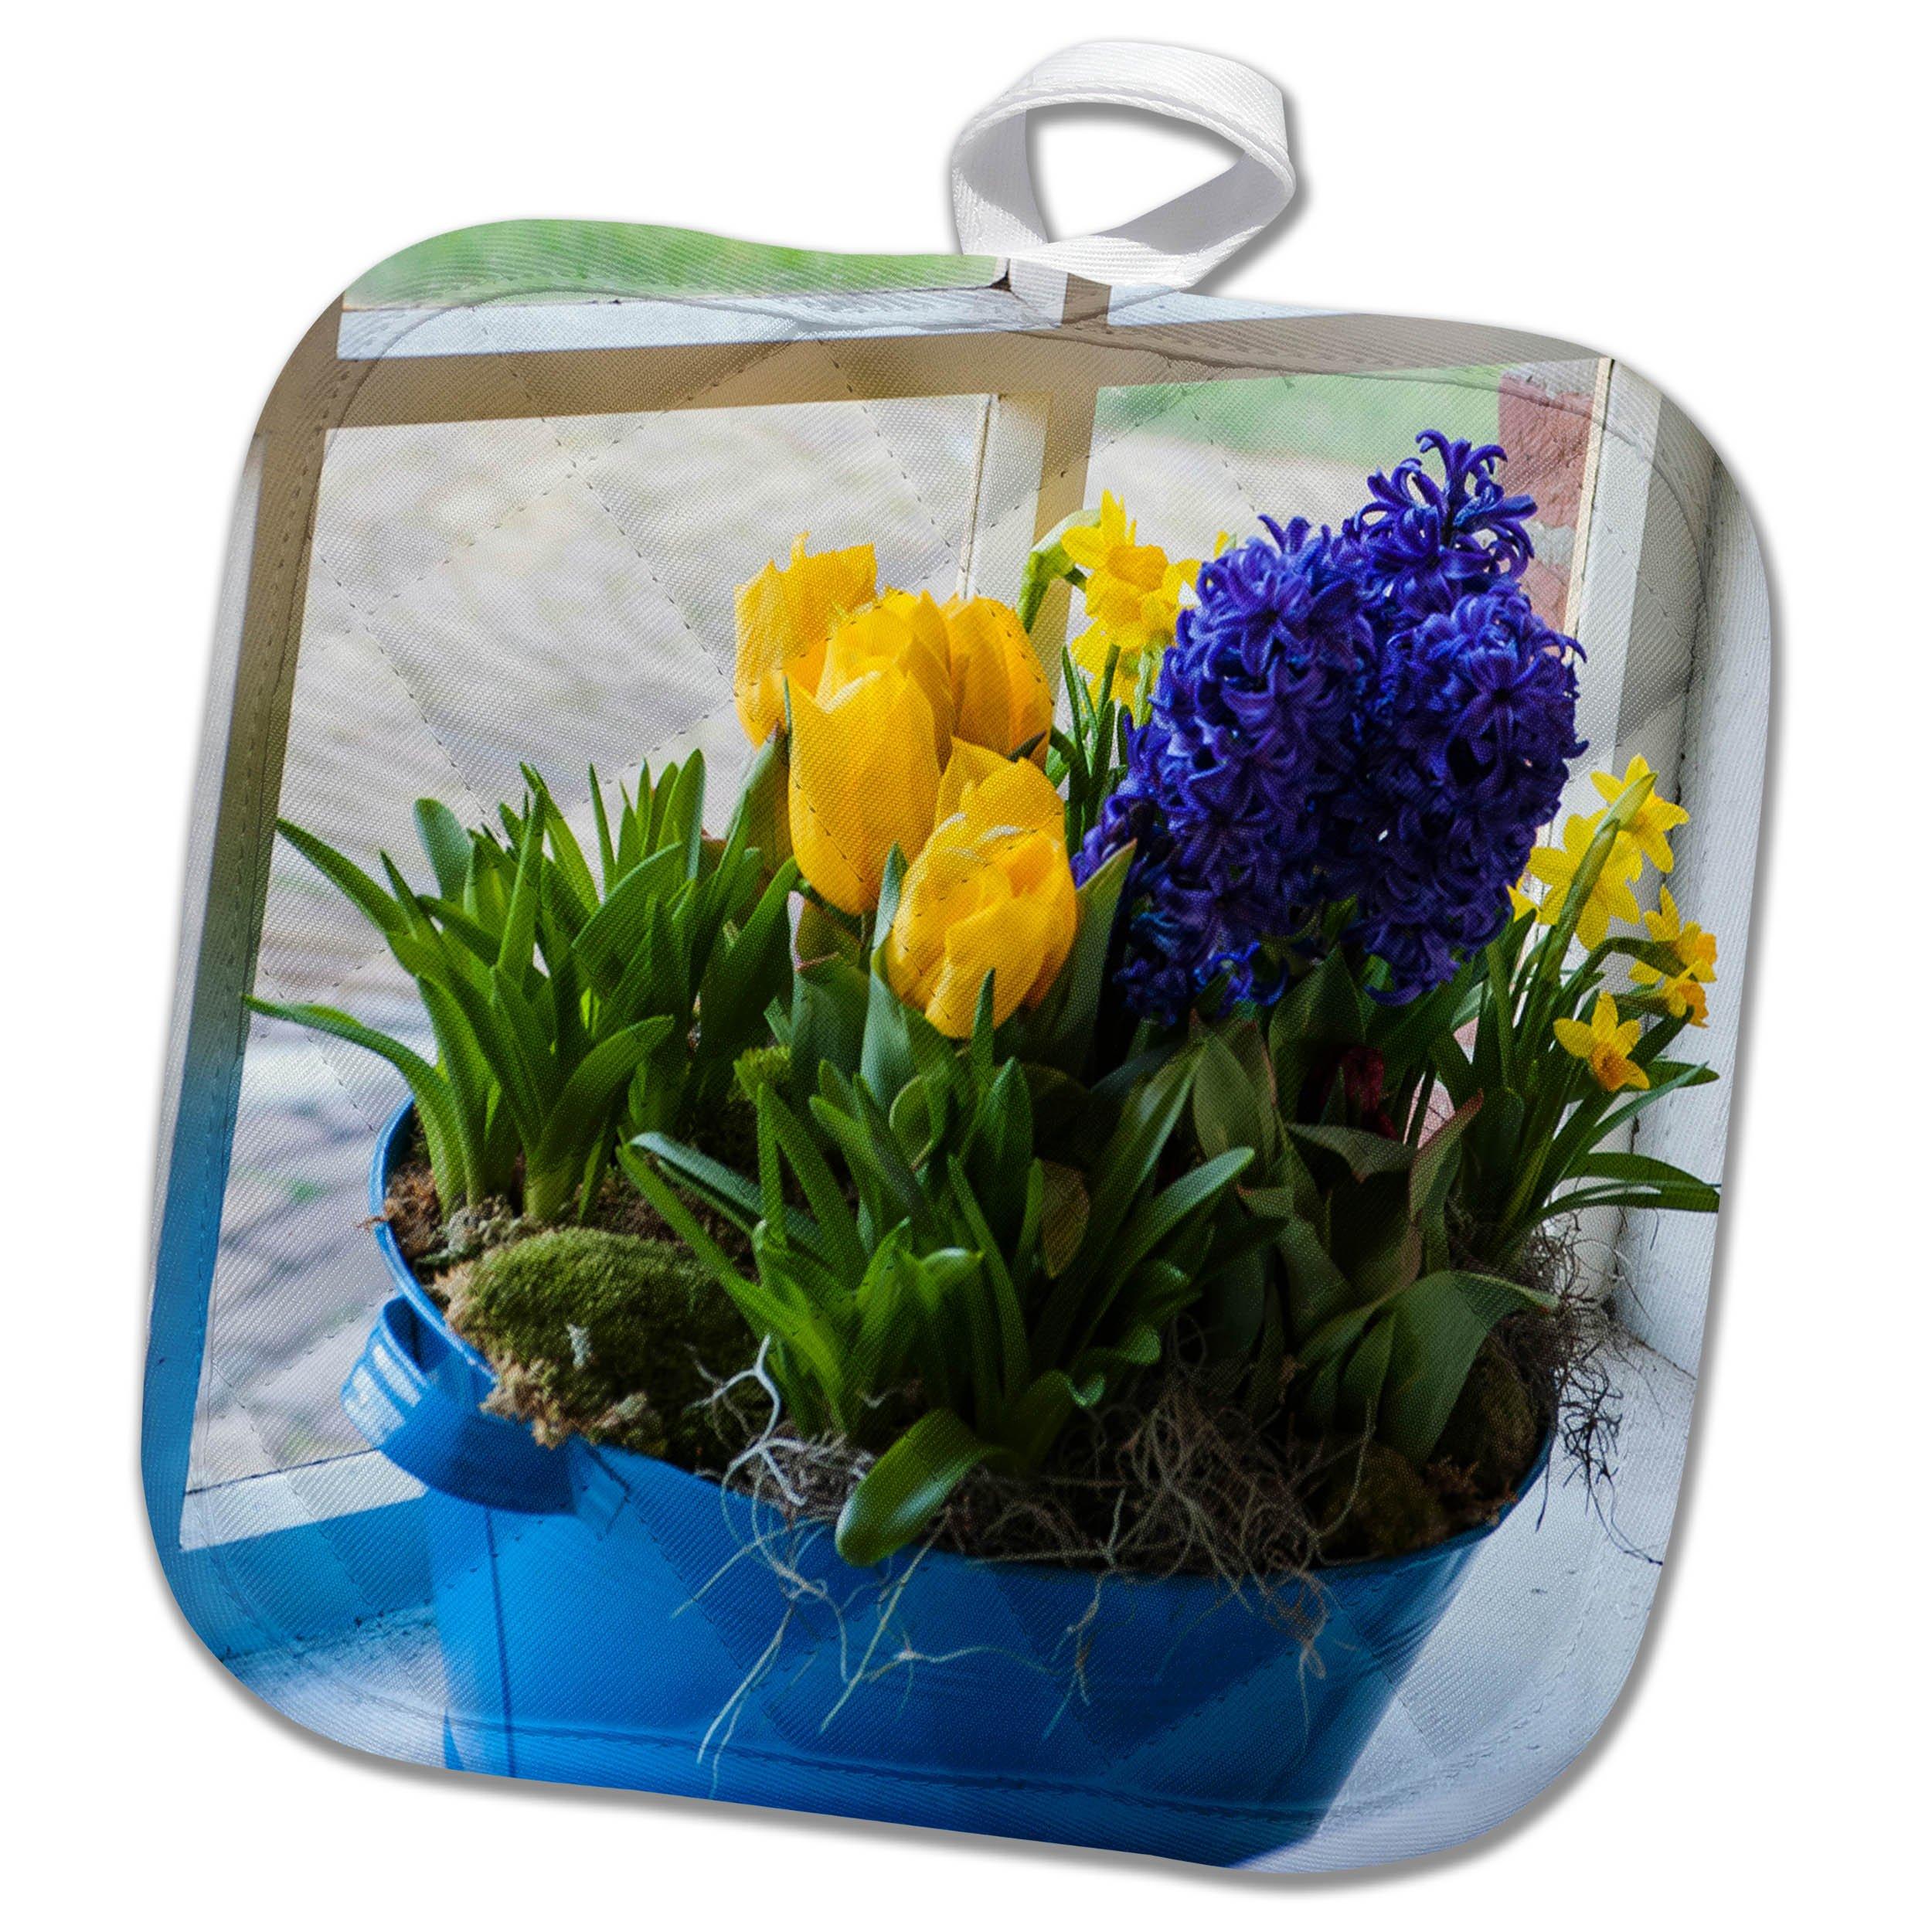 3dRose Danita Delimont - Flowers - Window with spring flower arrangement - 8x8 Potholder (phl_257775_1)